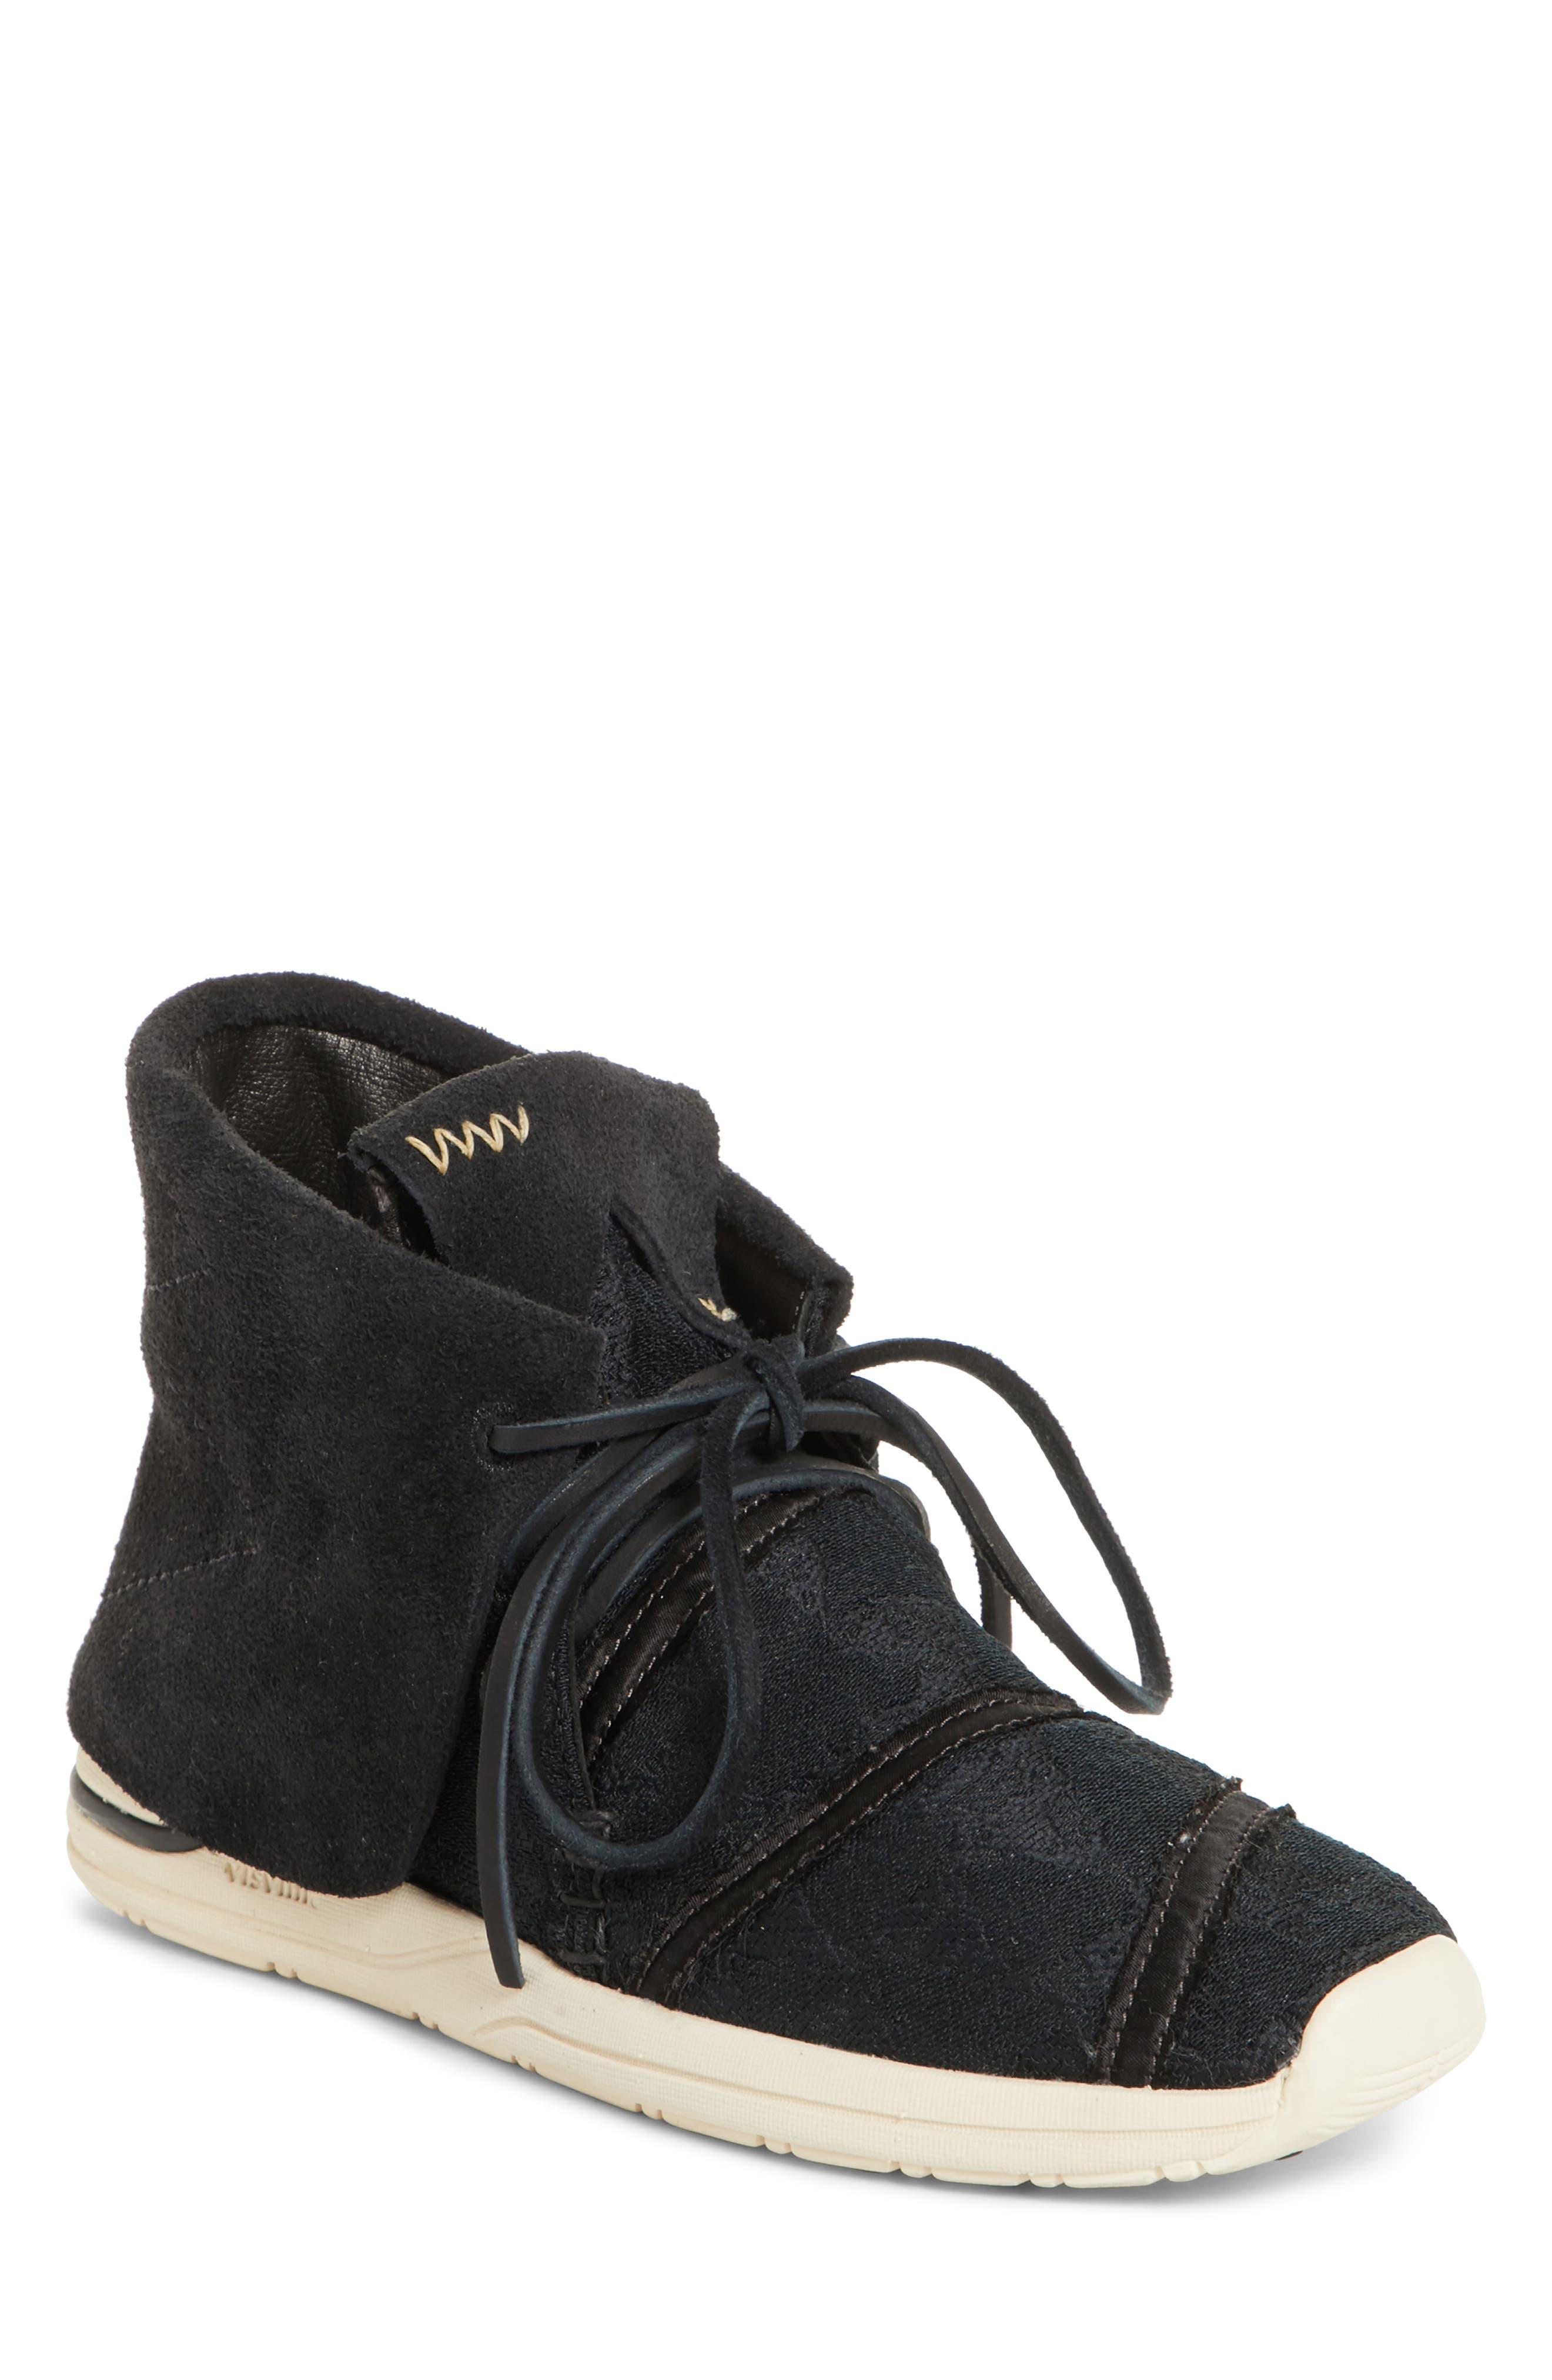 Huron Lhamo Hi Folk Hidden Wedge Sneaker,                         Main,                         color, 004